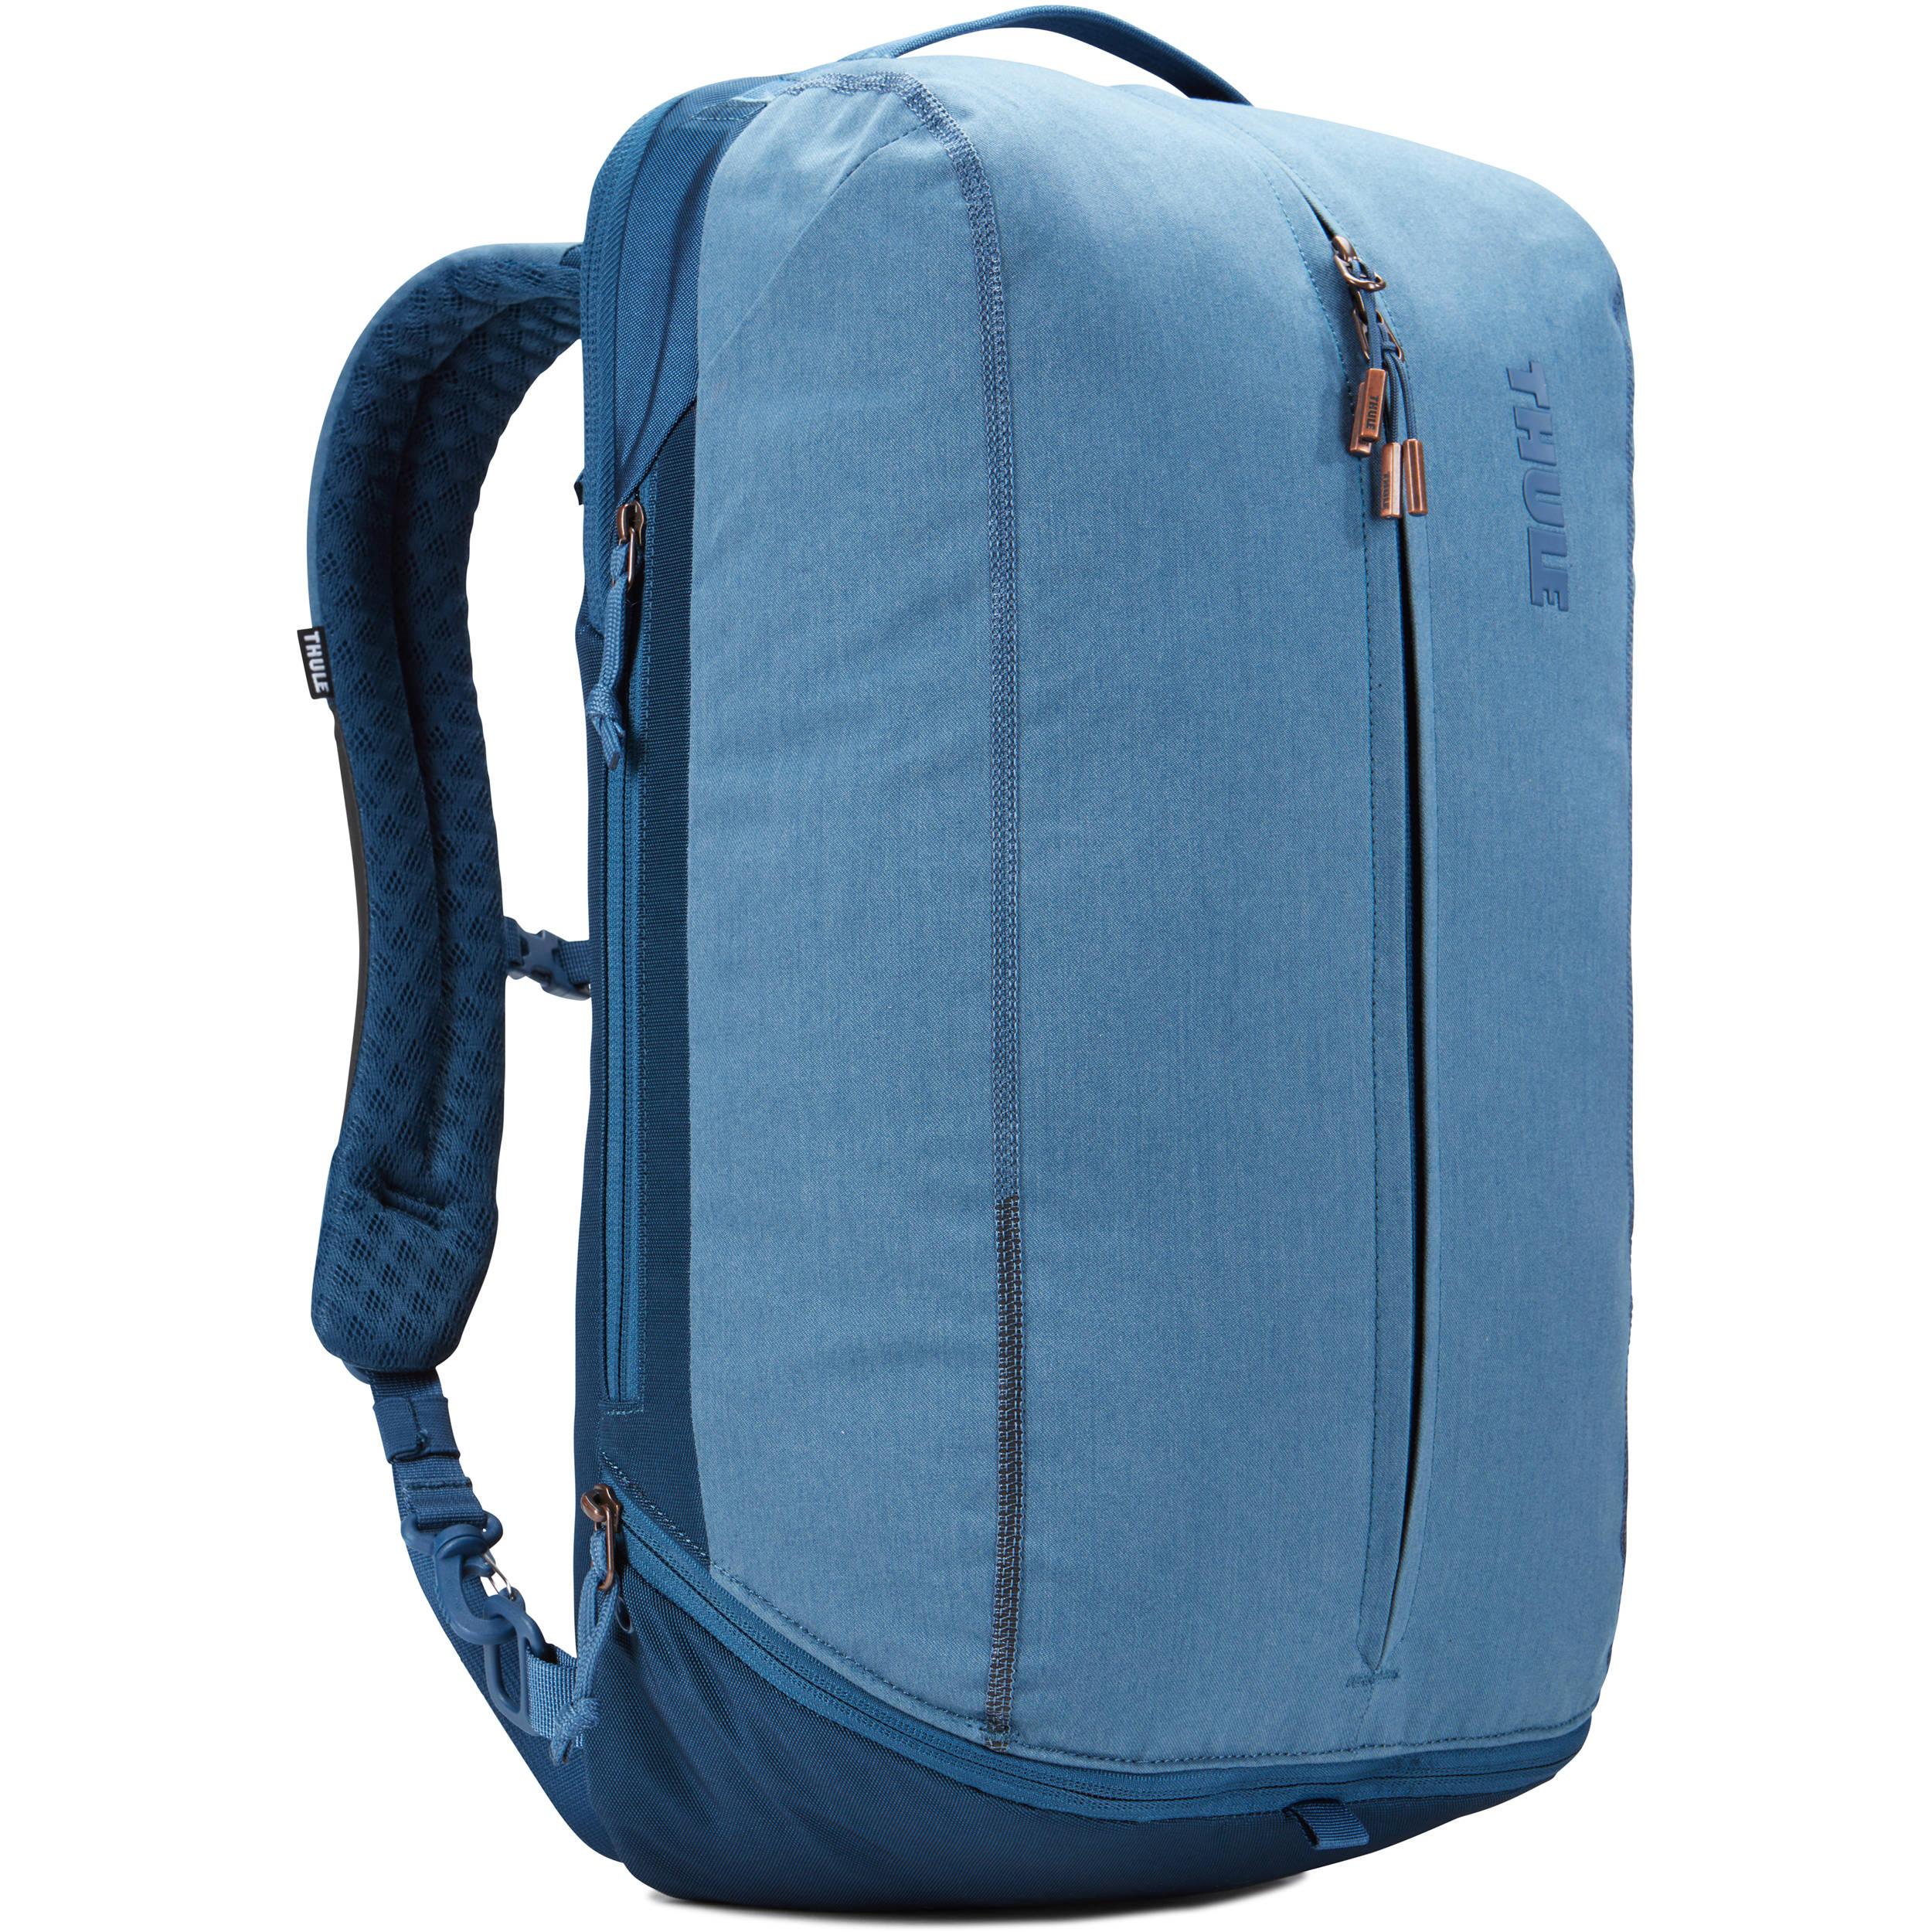 Thule Vea 21L Backpack (Light Navy) 3203510 B&H Photo Video